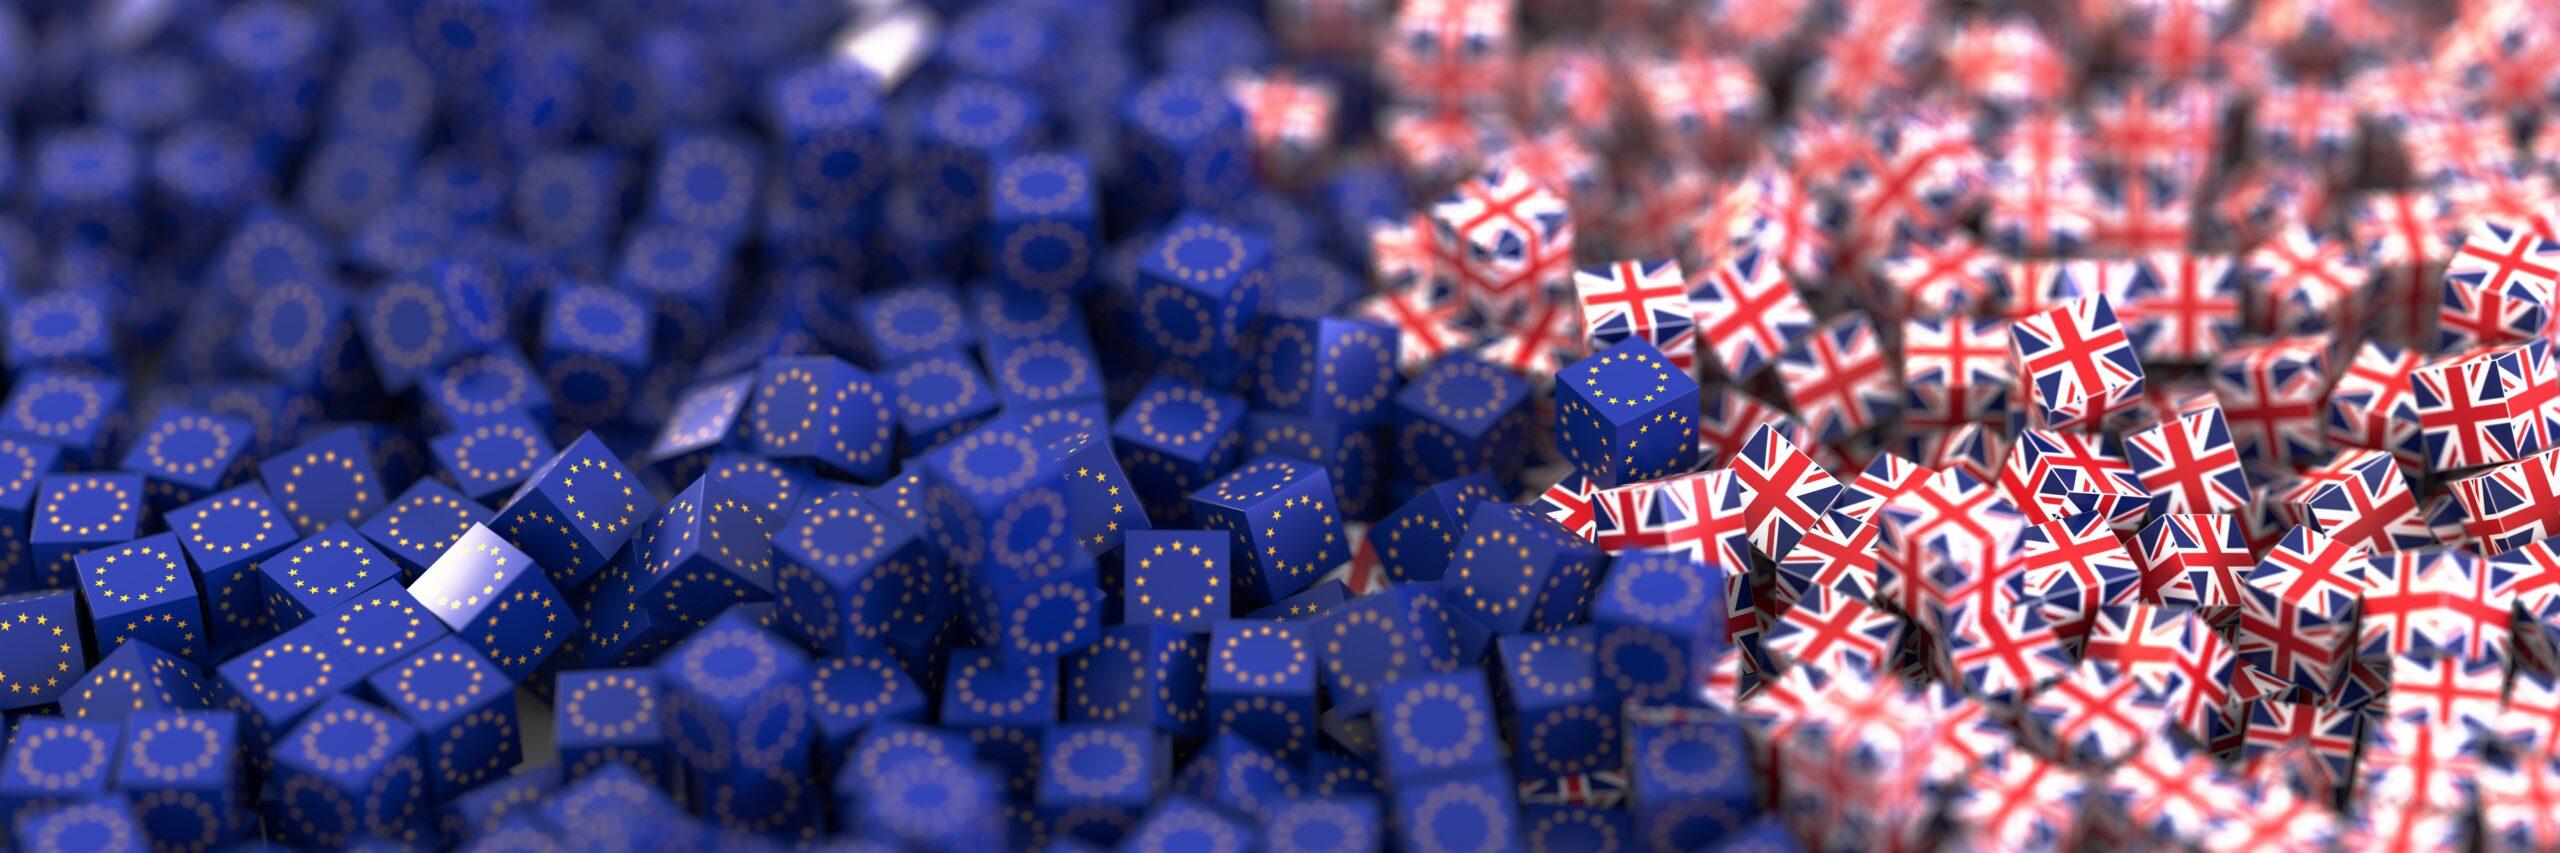 Brexit-EU-UK-tostphoto-adobe.jpeg